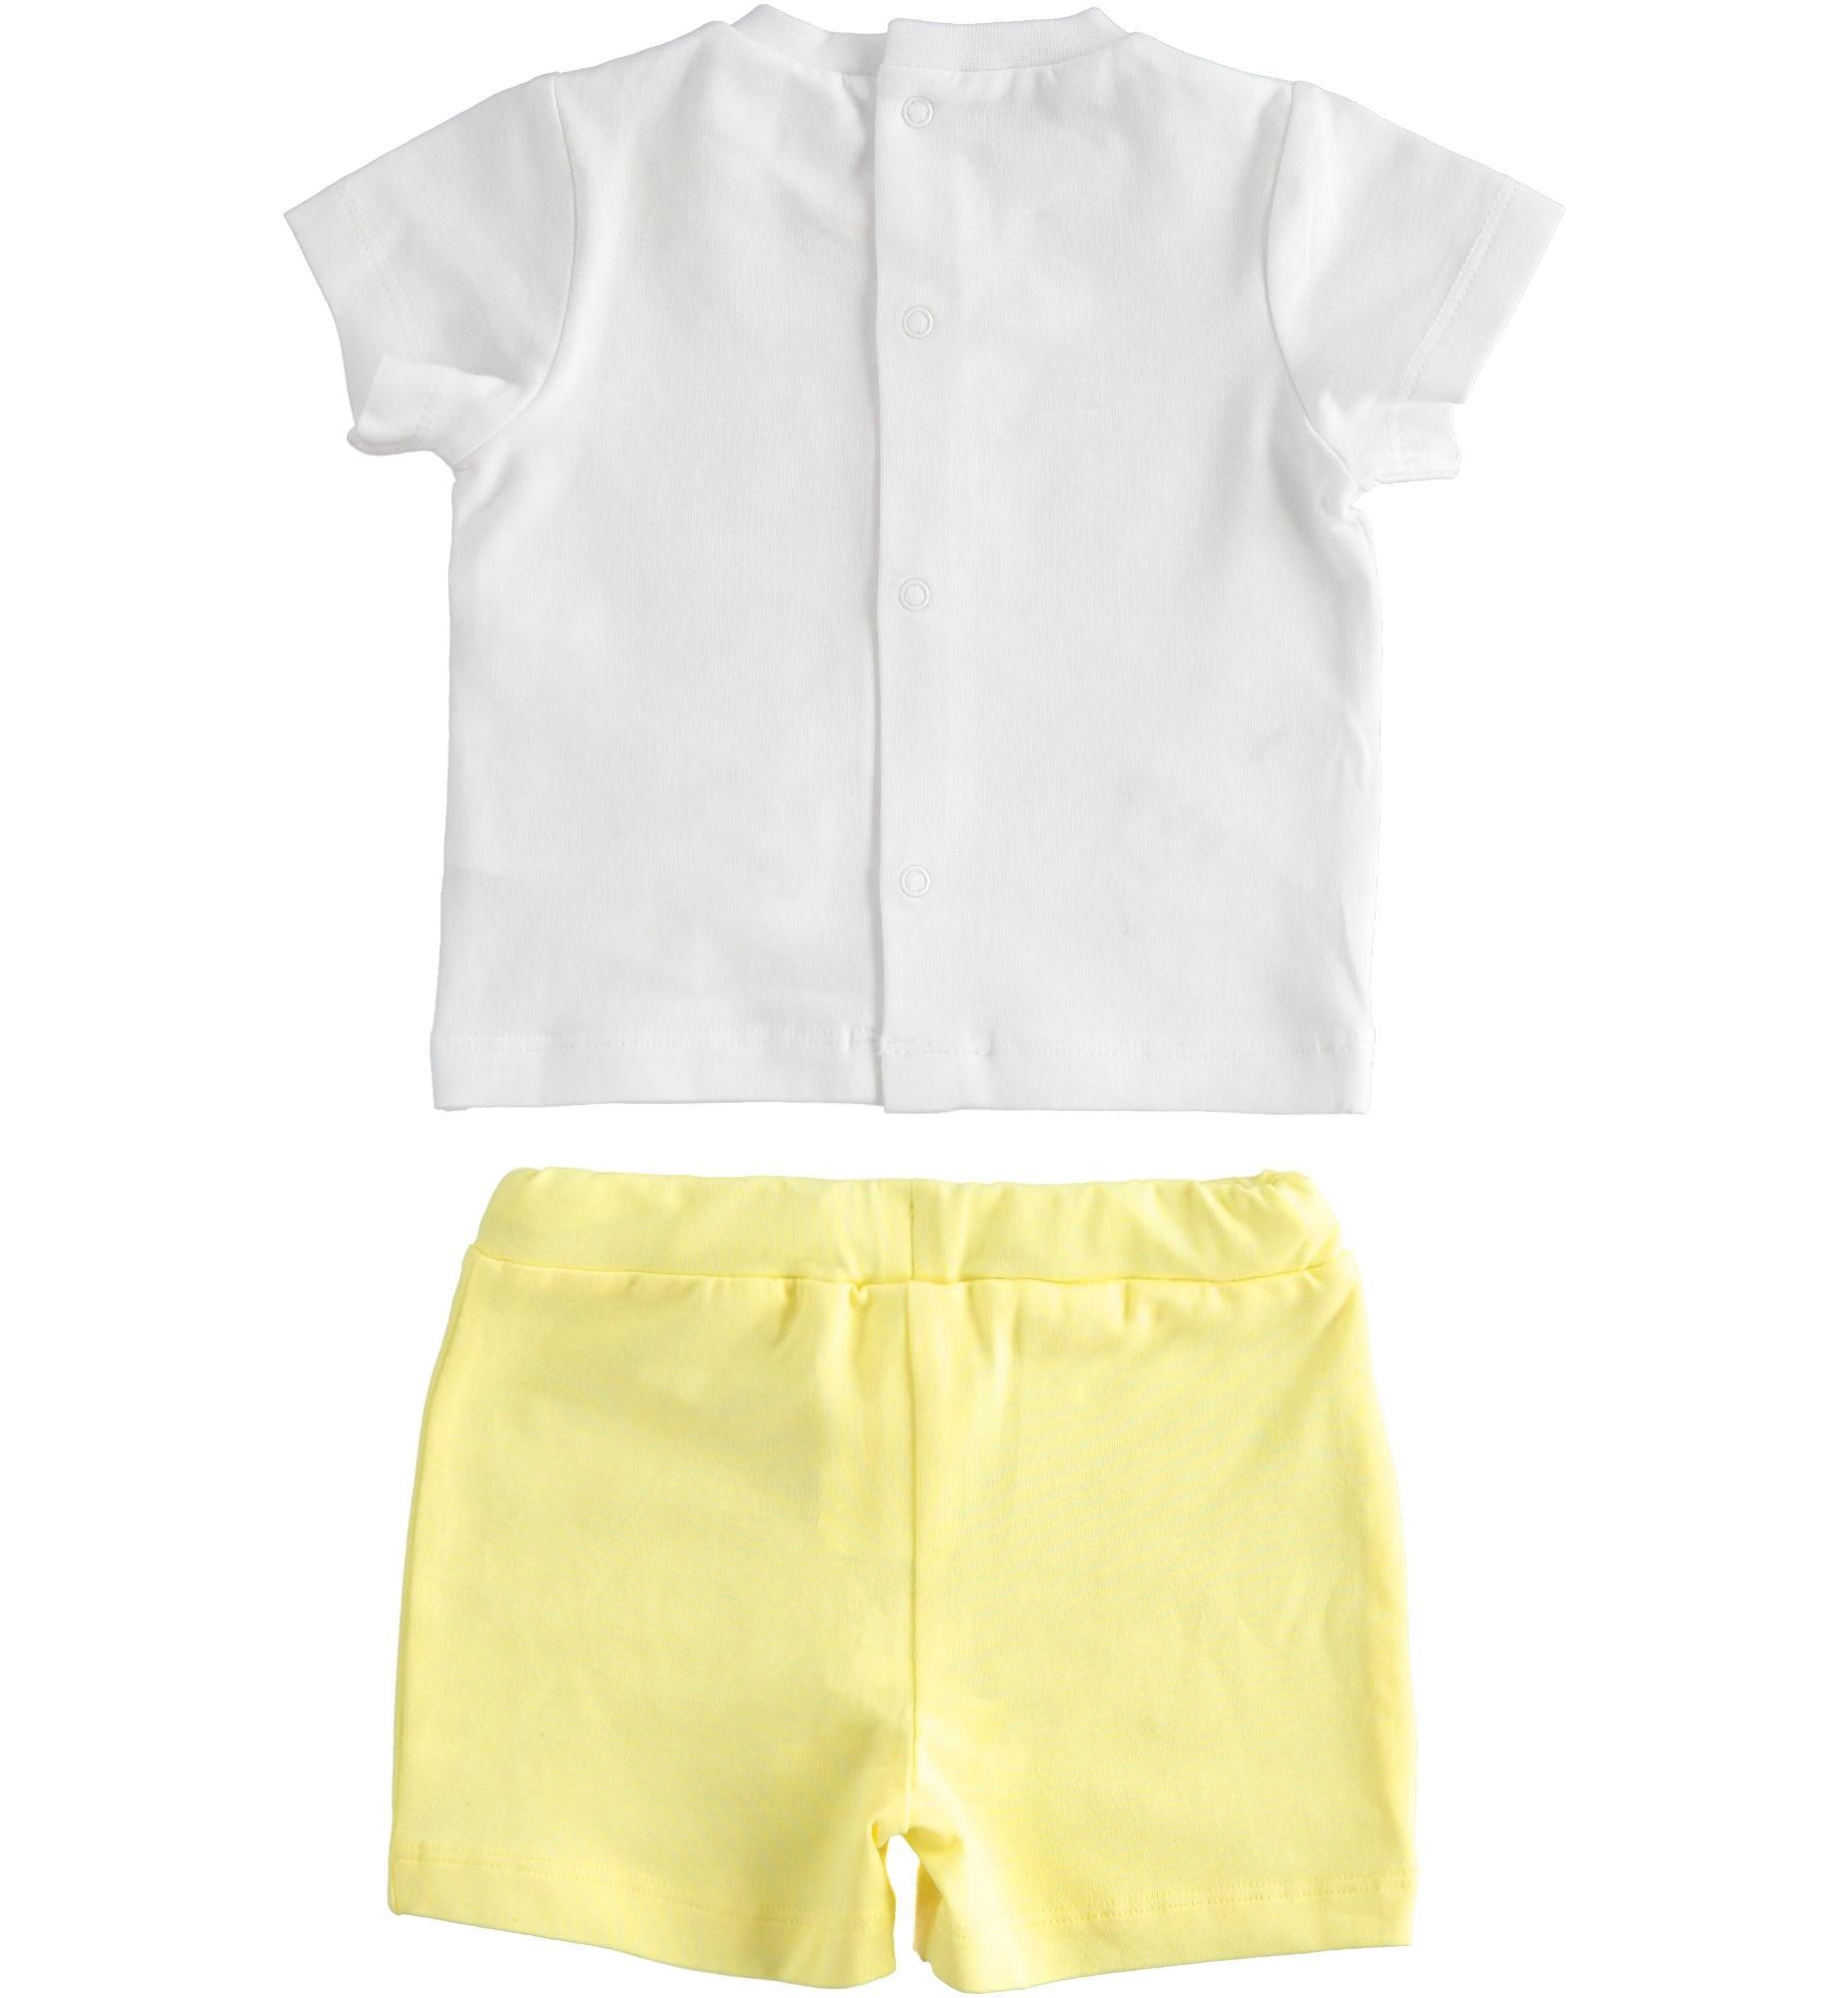 Ido Ido Summer Bunny Boy Short Set 2091 S21